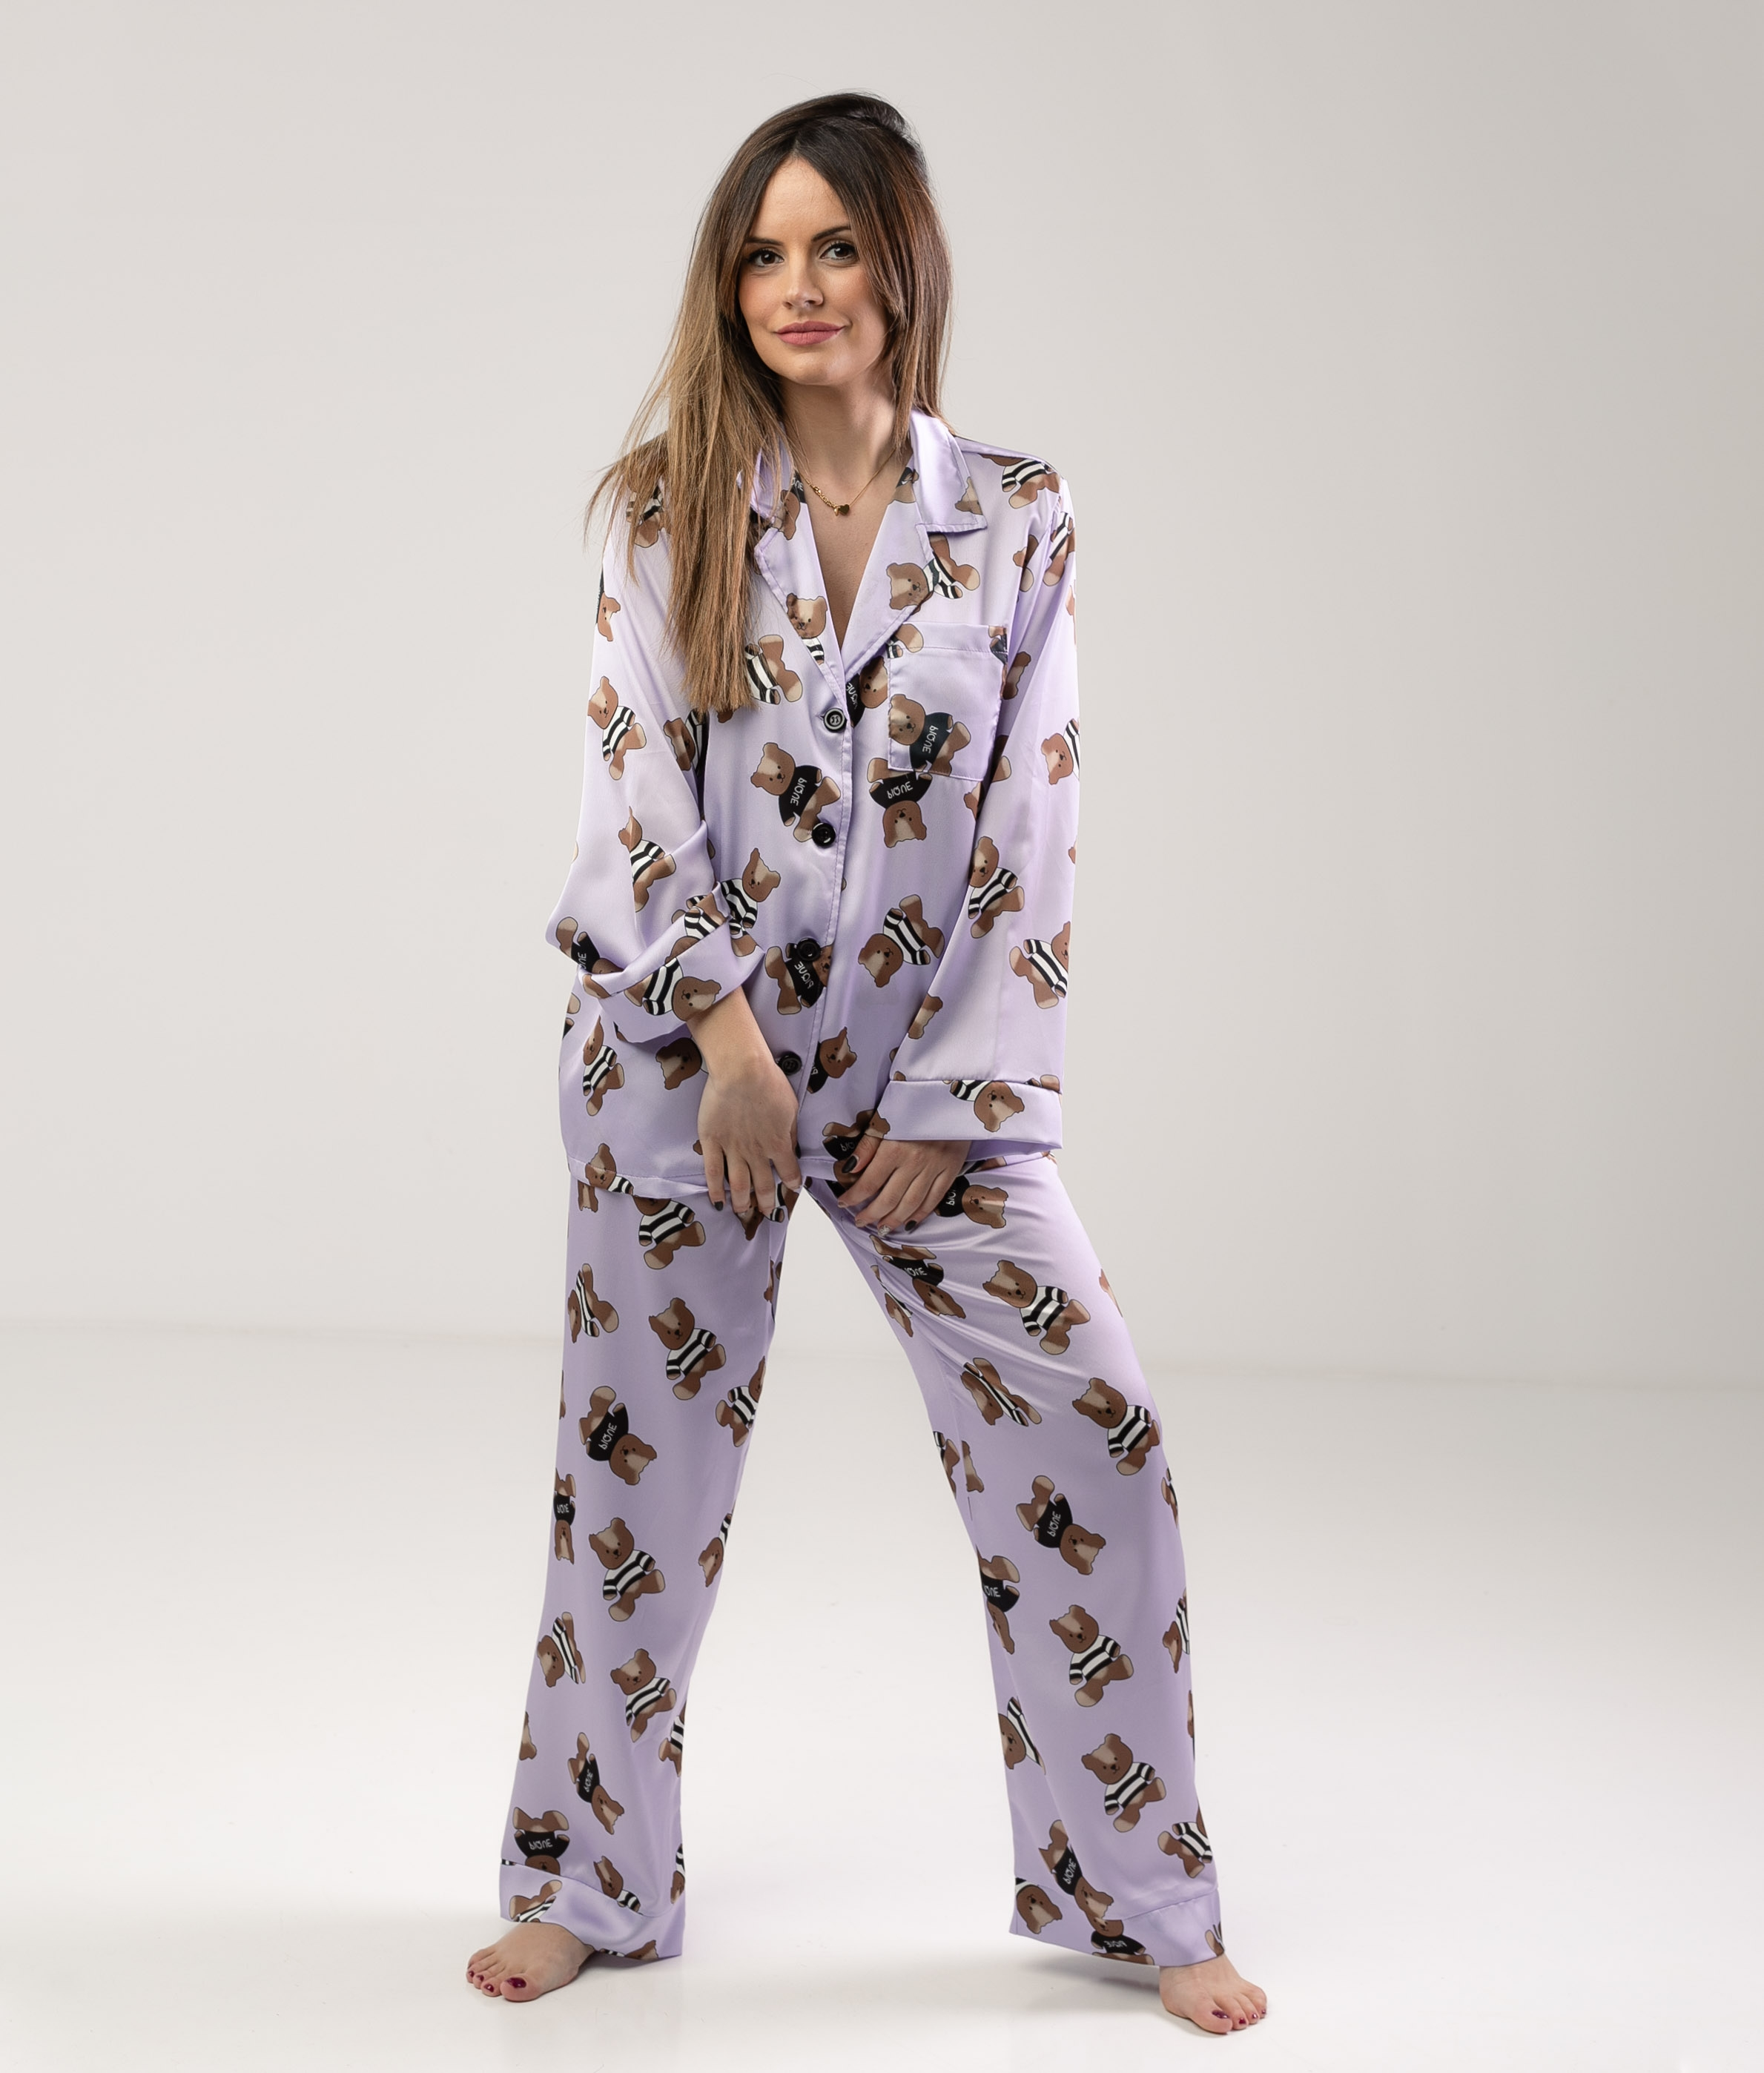 Pijama Xinkon - Lilás